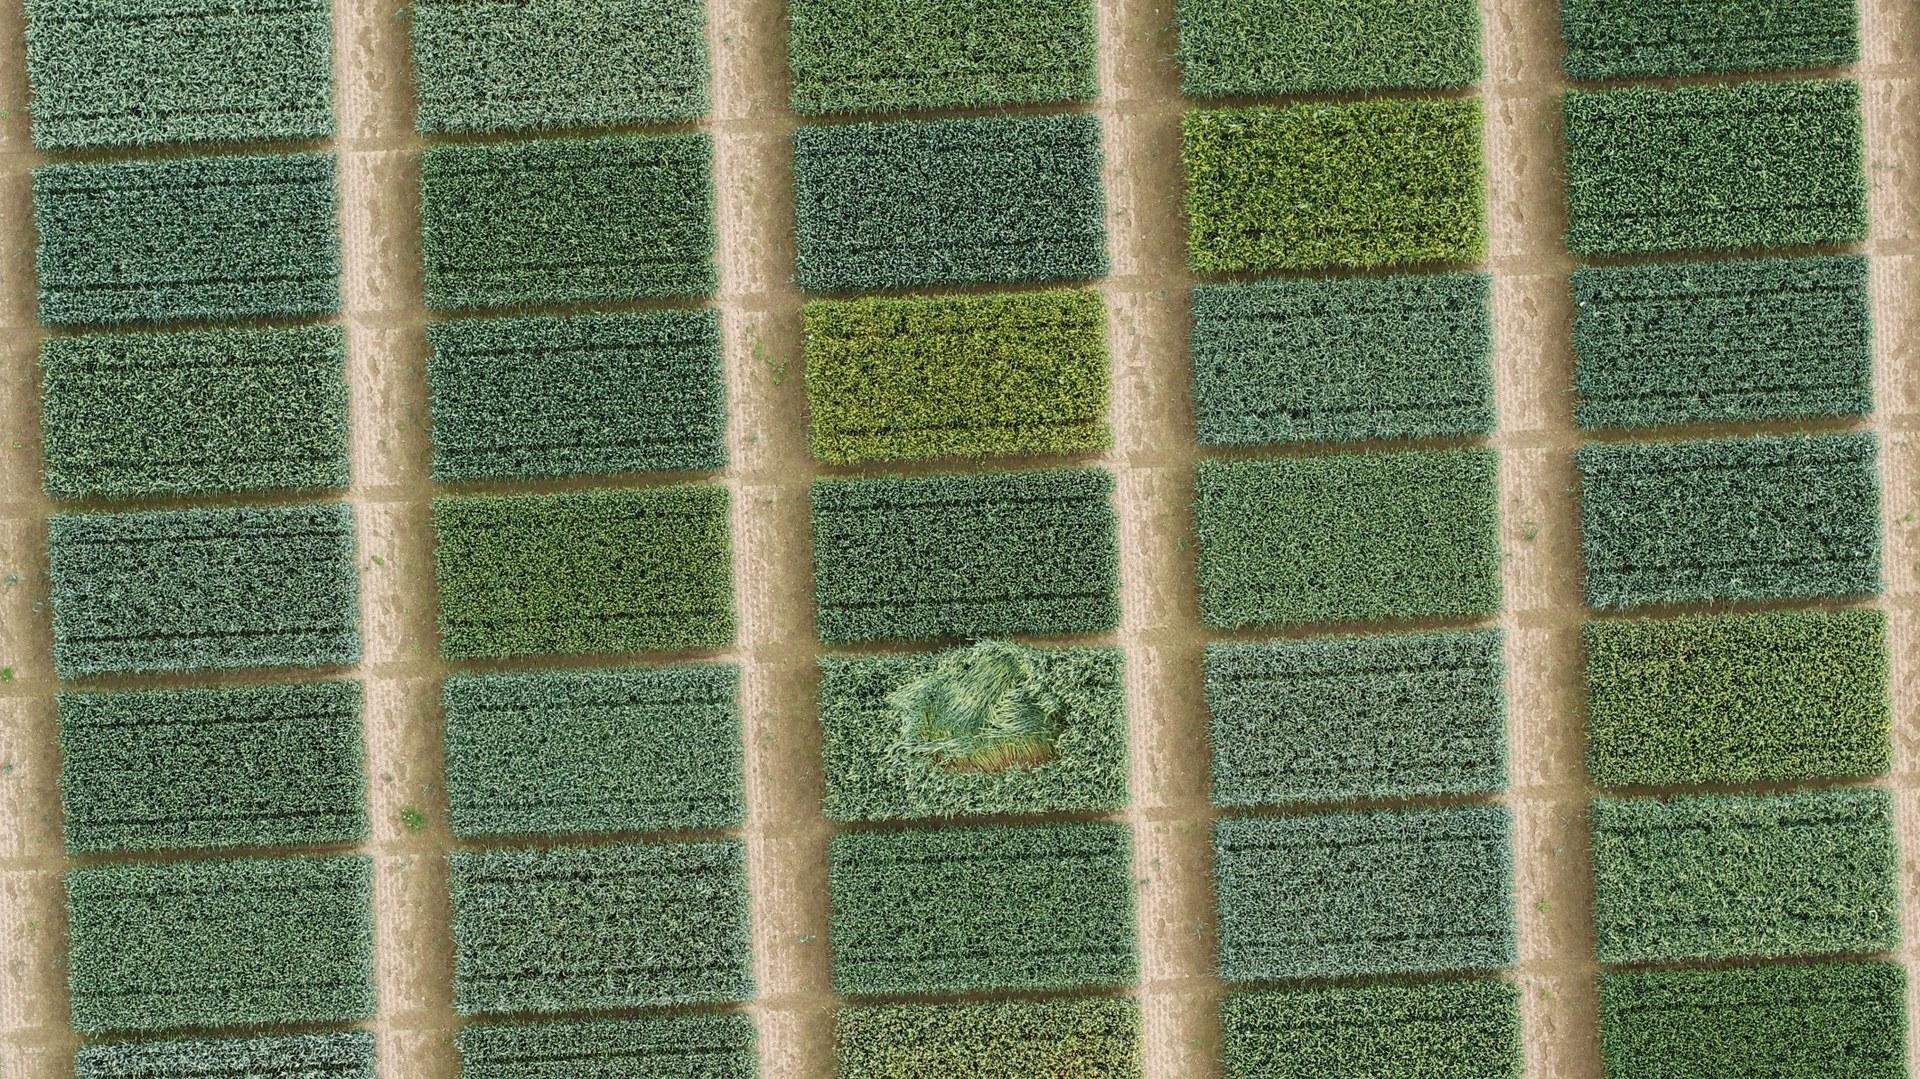 Wheat plots,